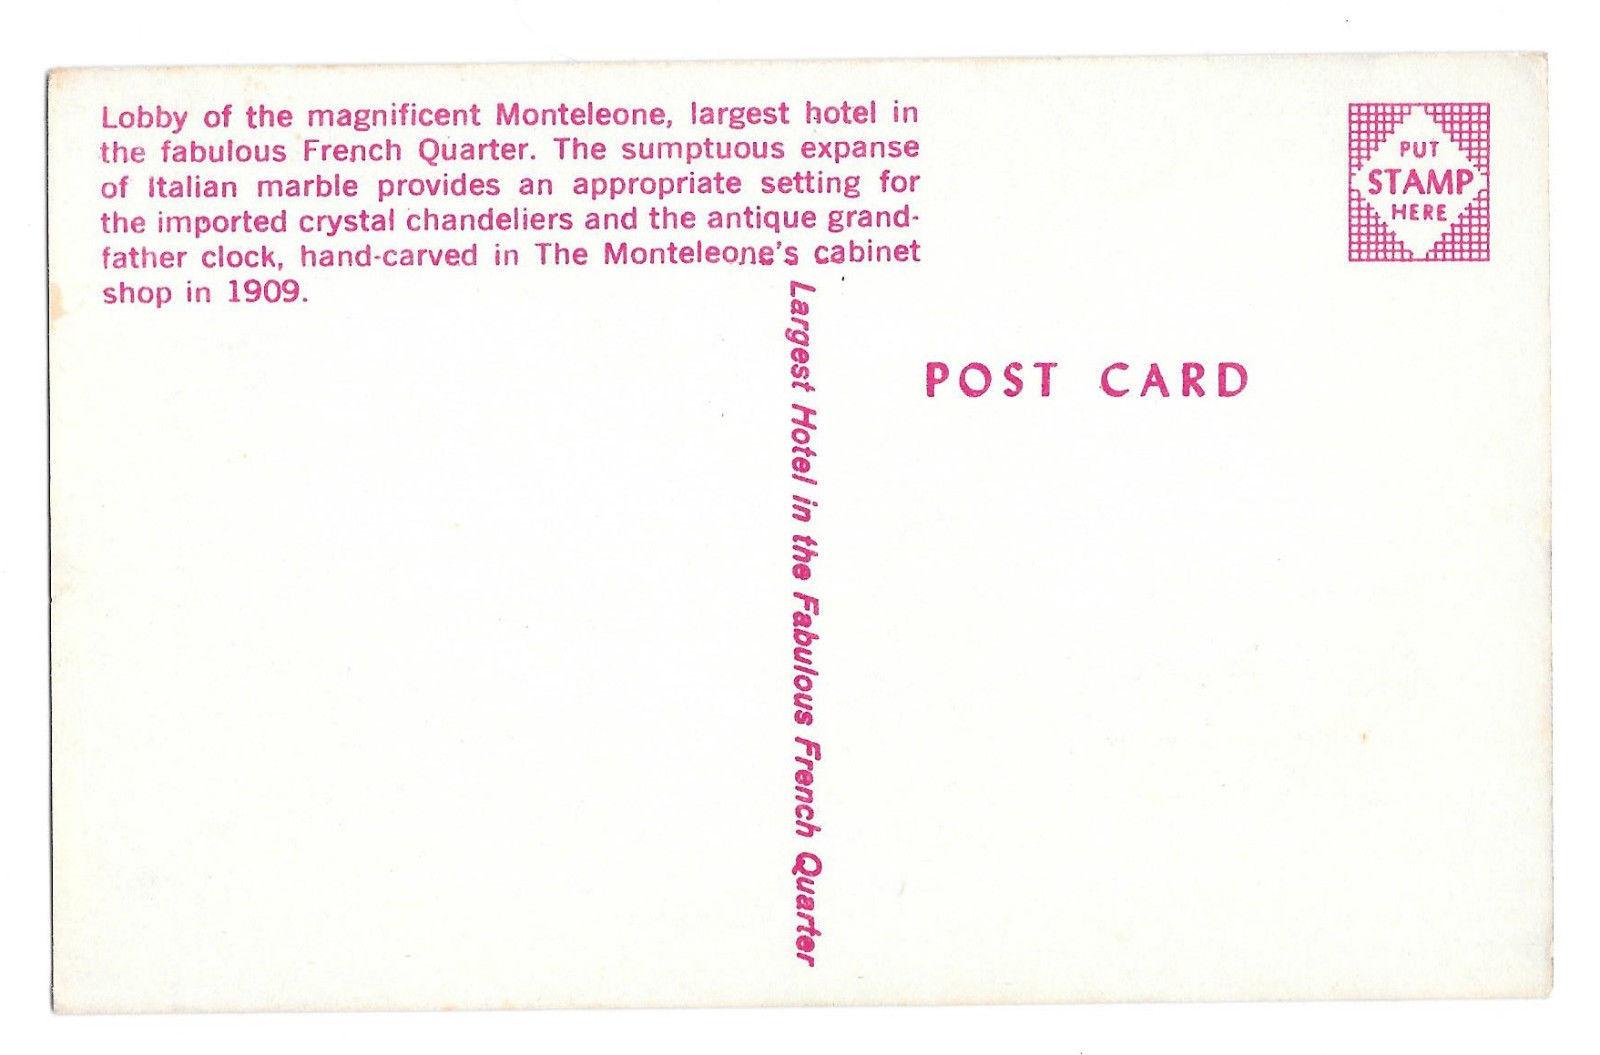 LA New Orleans Hotel Monteleone French Quarter Marble Lobby Vtg Postcard